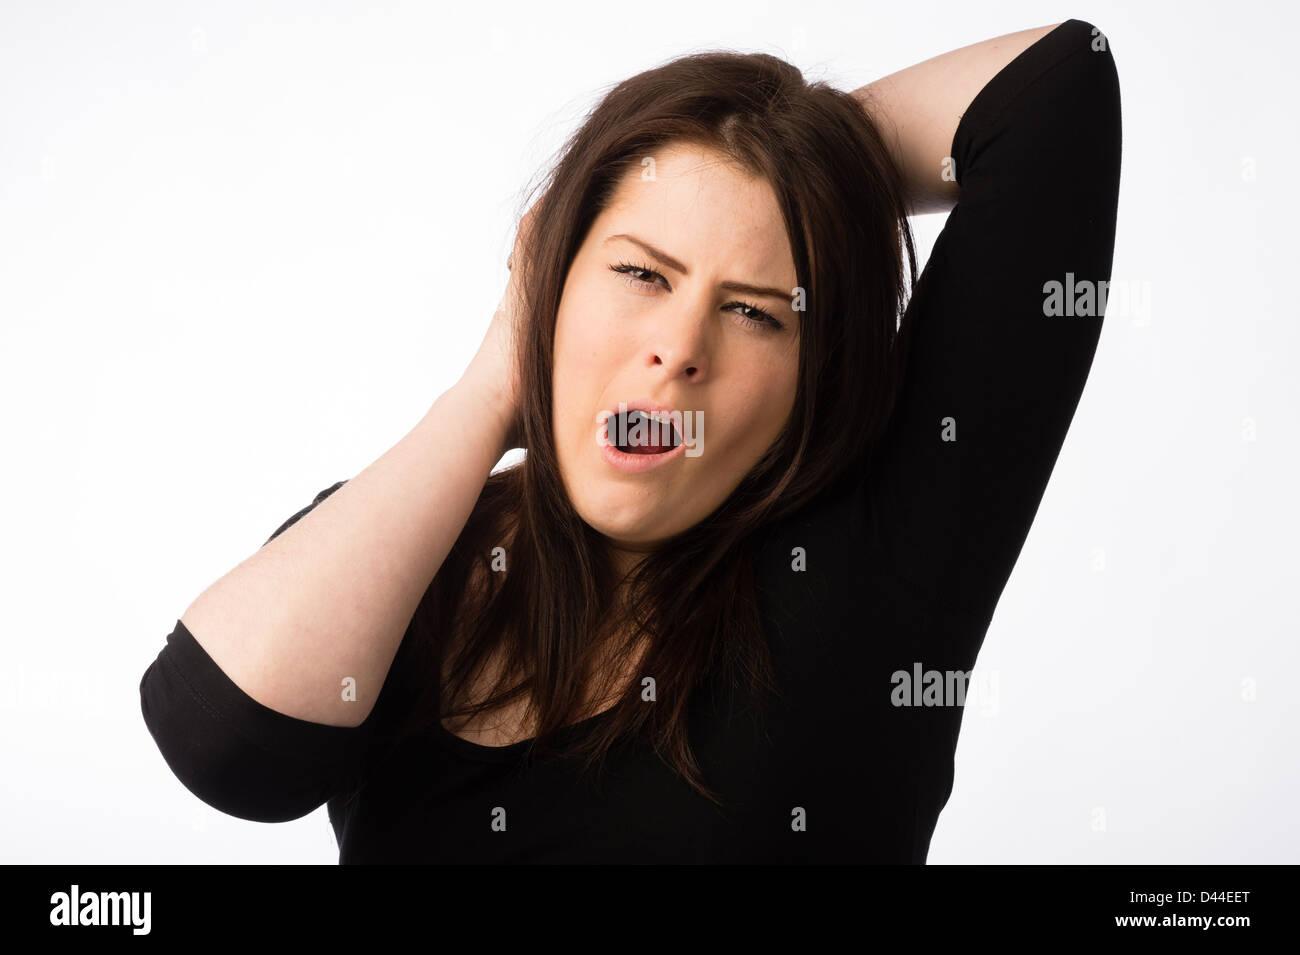 A young tired sleepy yawning woman, brown hair, UK Stock Photo